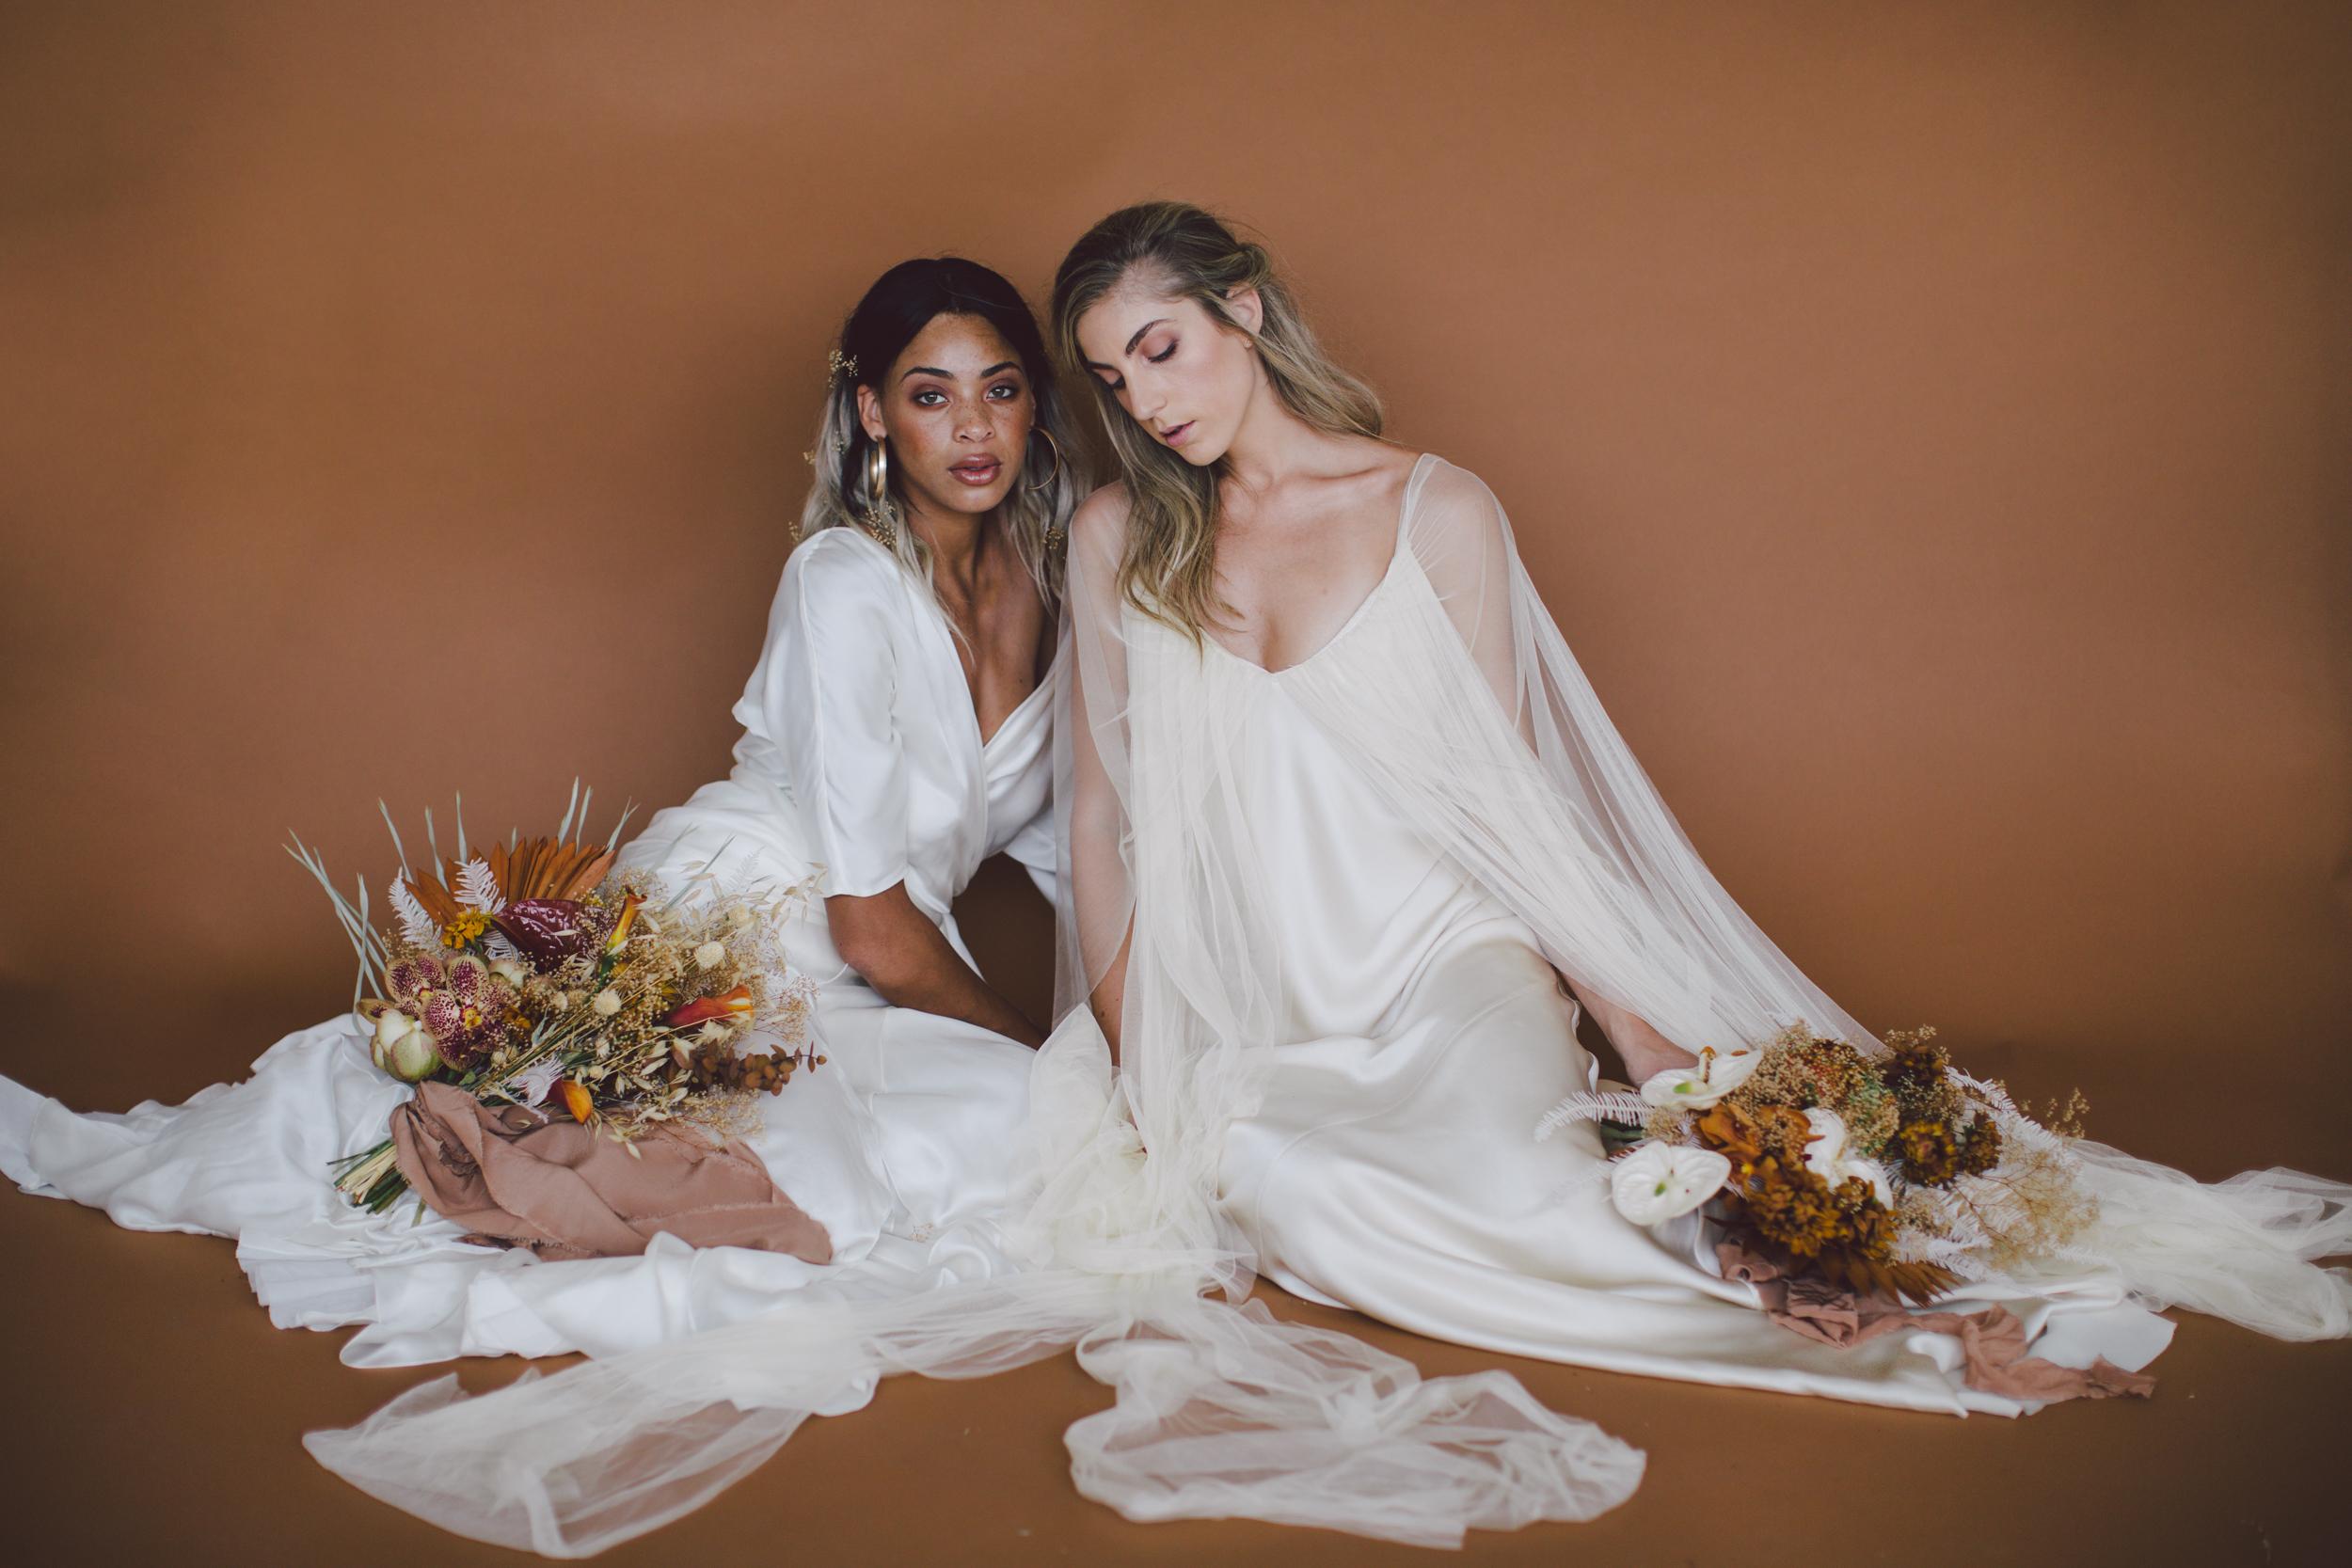 cortana simple wedding dress los angeles styled shoot lookbook sienna